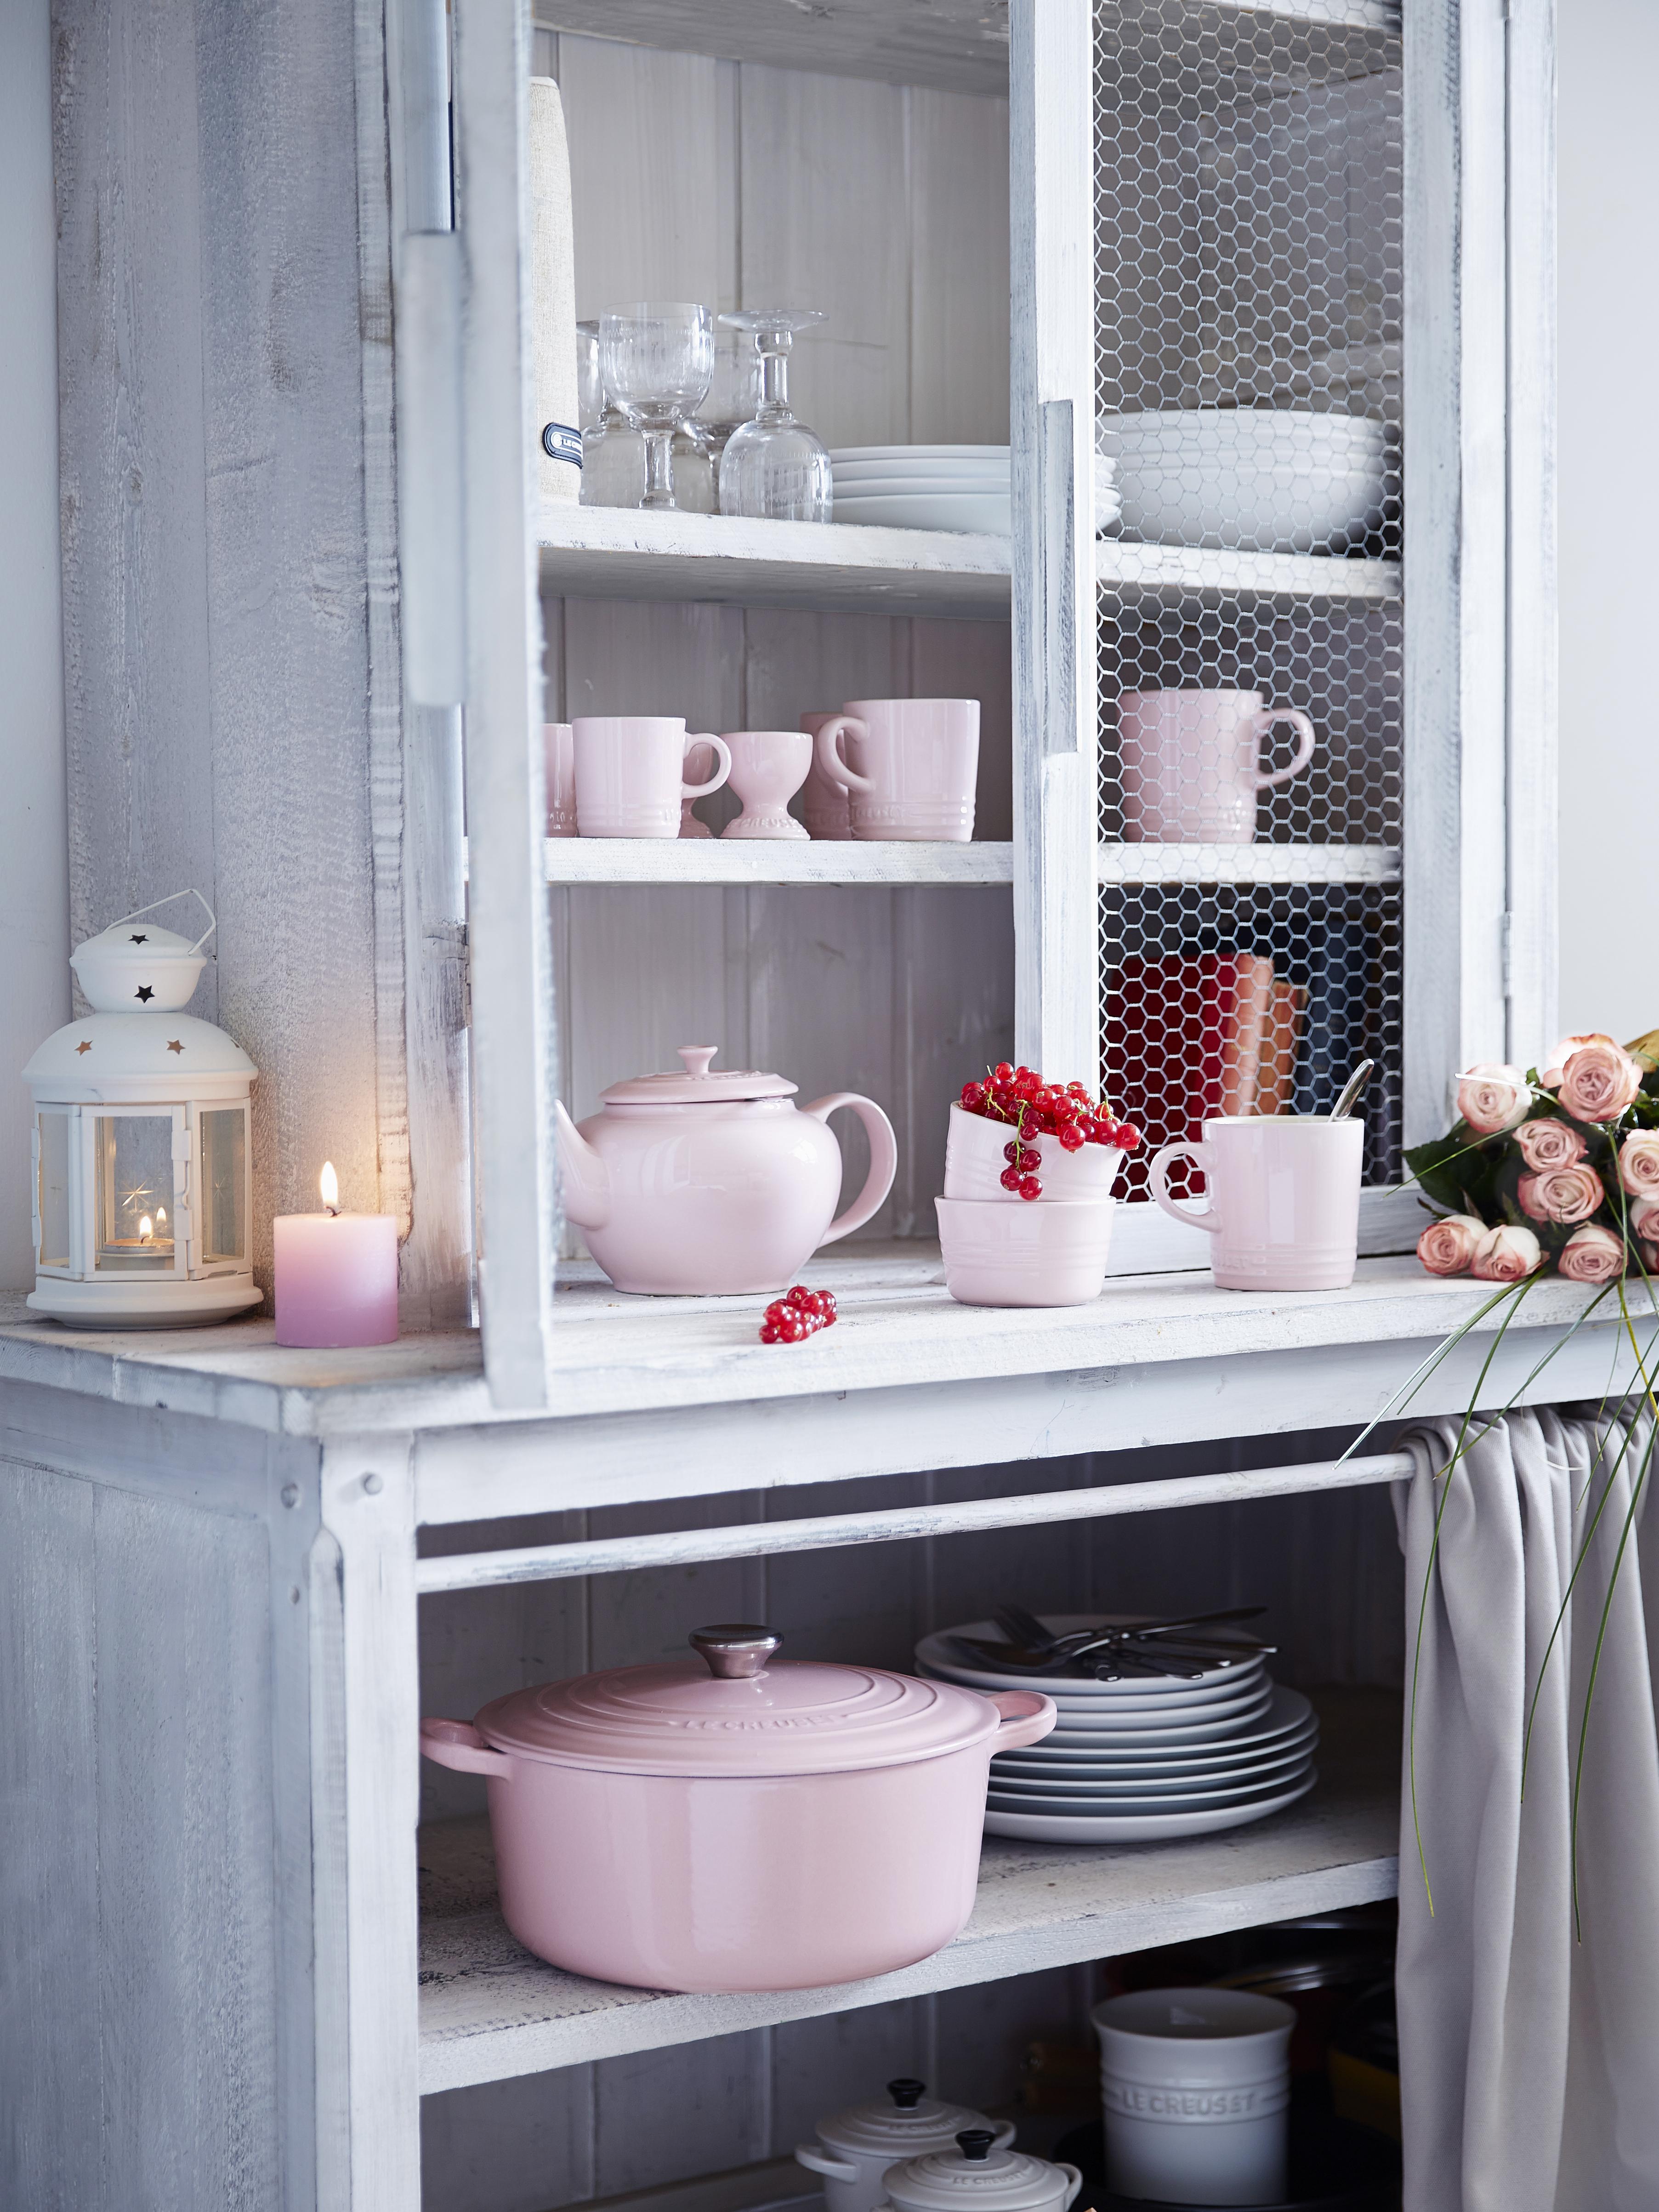 gescoord de chiffon pink koffiebeker van le creuset van franse bodem. Black Bedroom Furniture Sets. Home Design Ideas